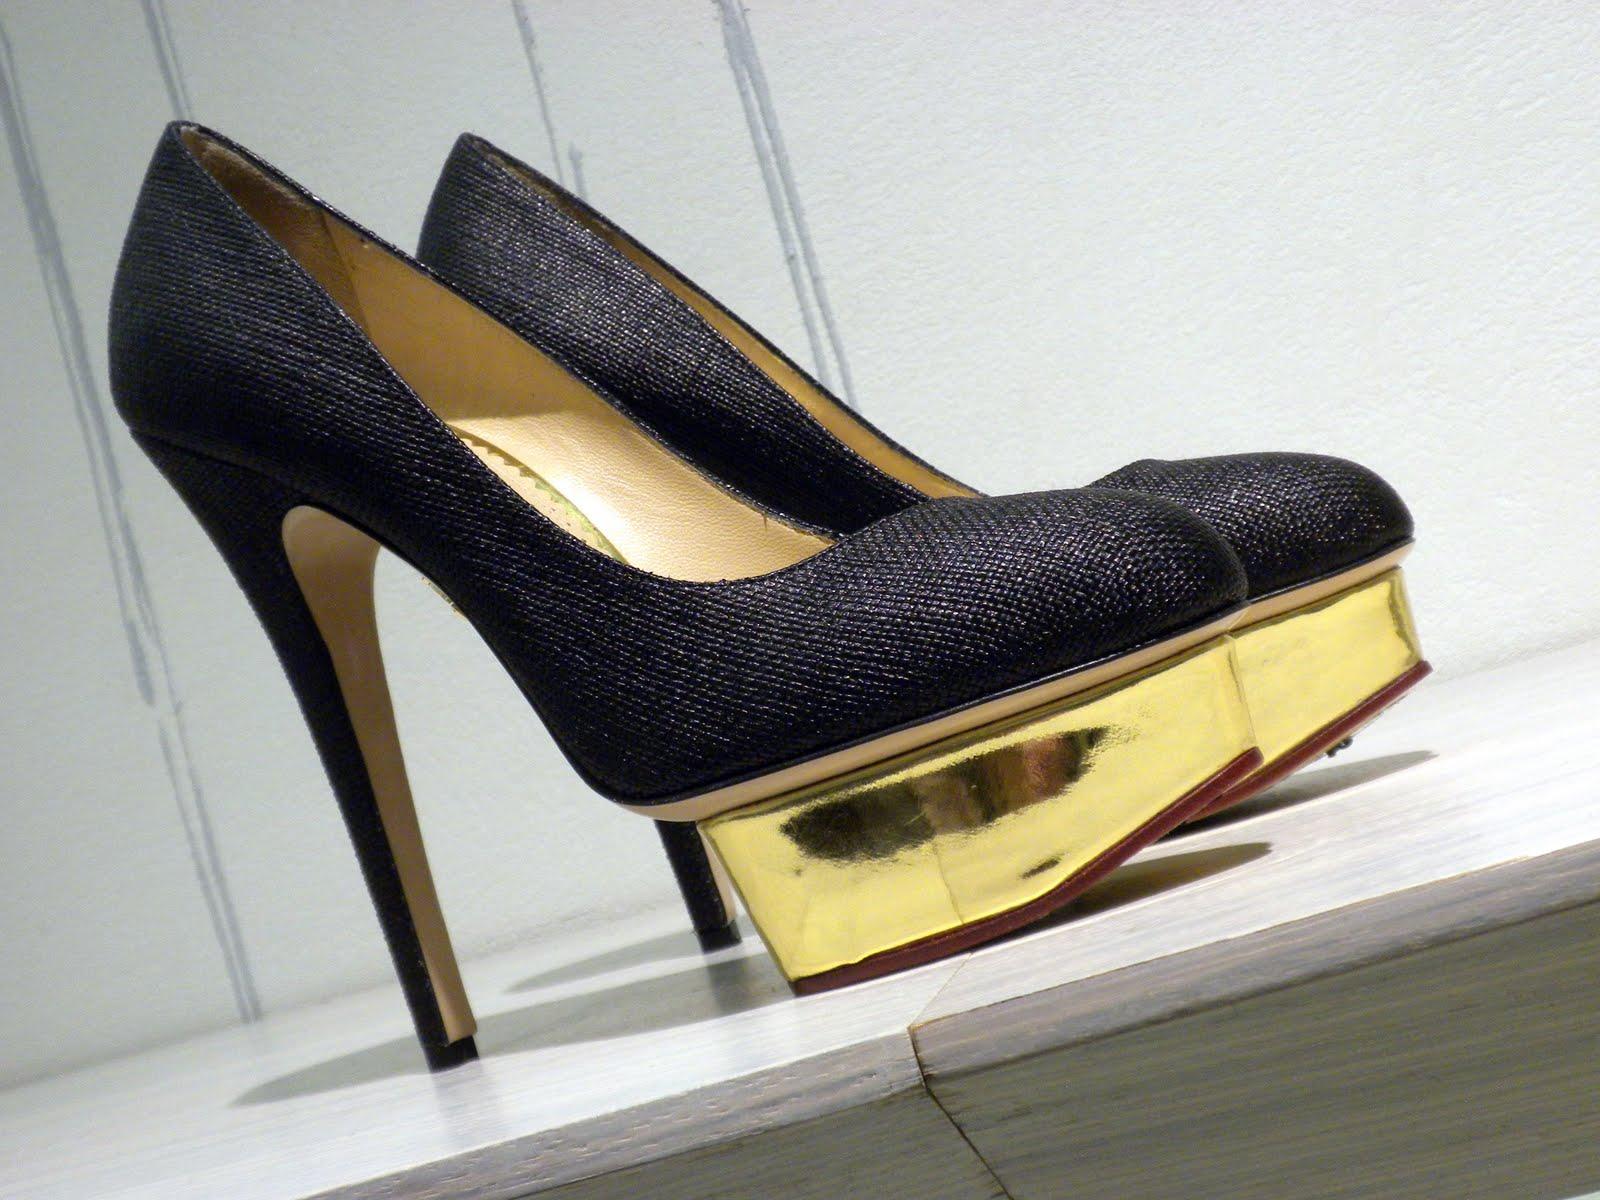 Rough \u0026amp; Refined: What makes a successful shoe designer?